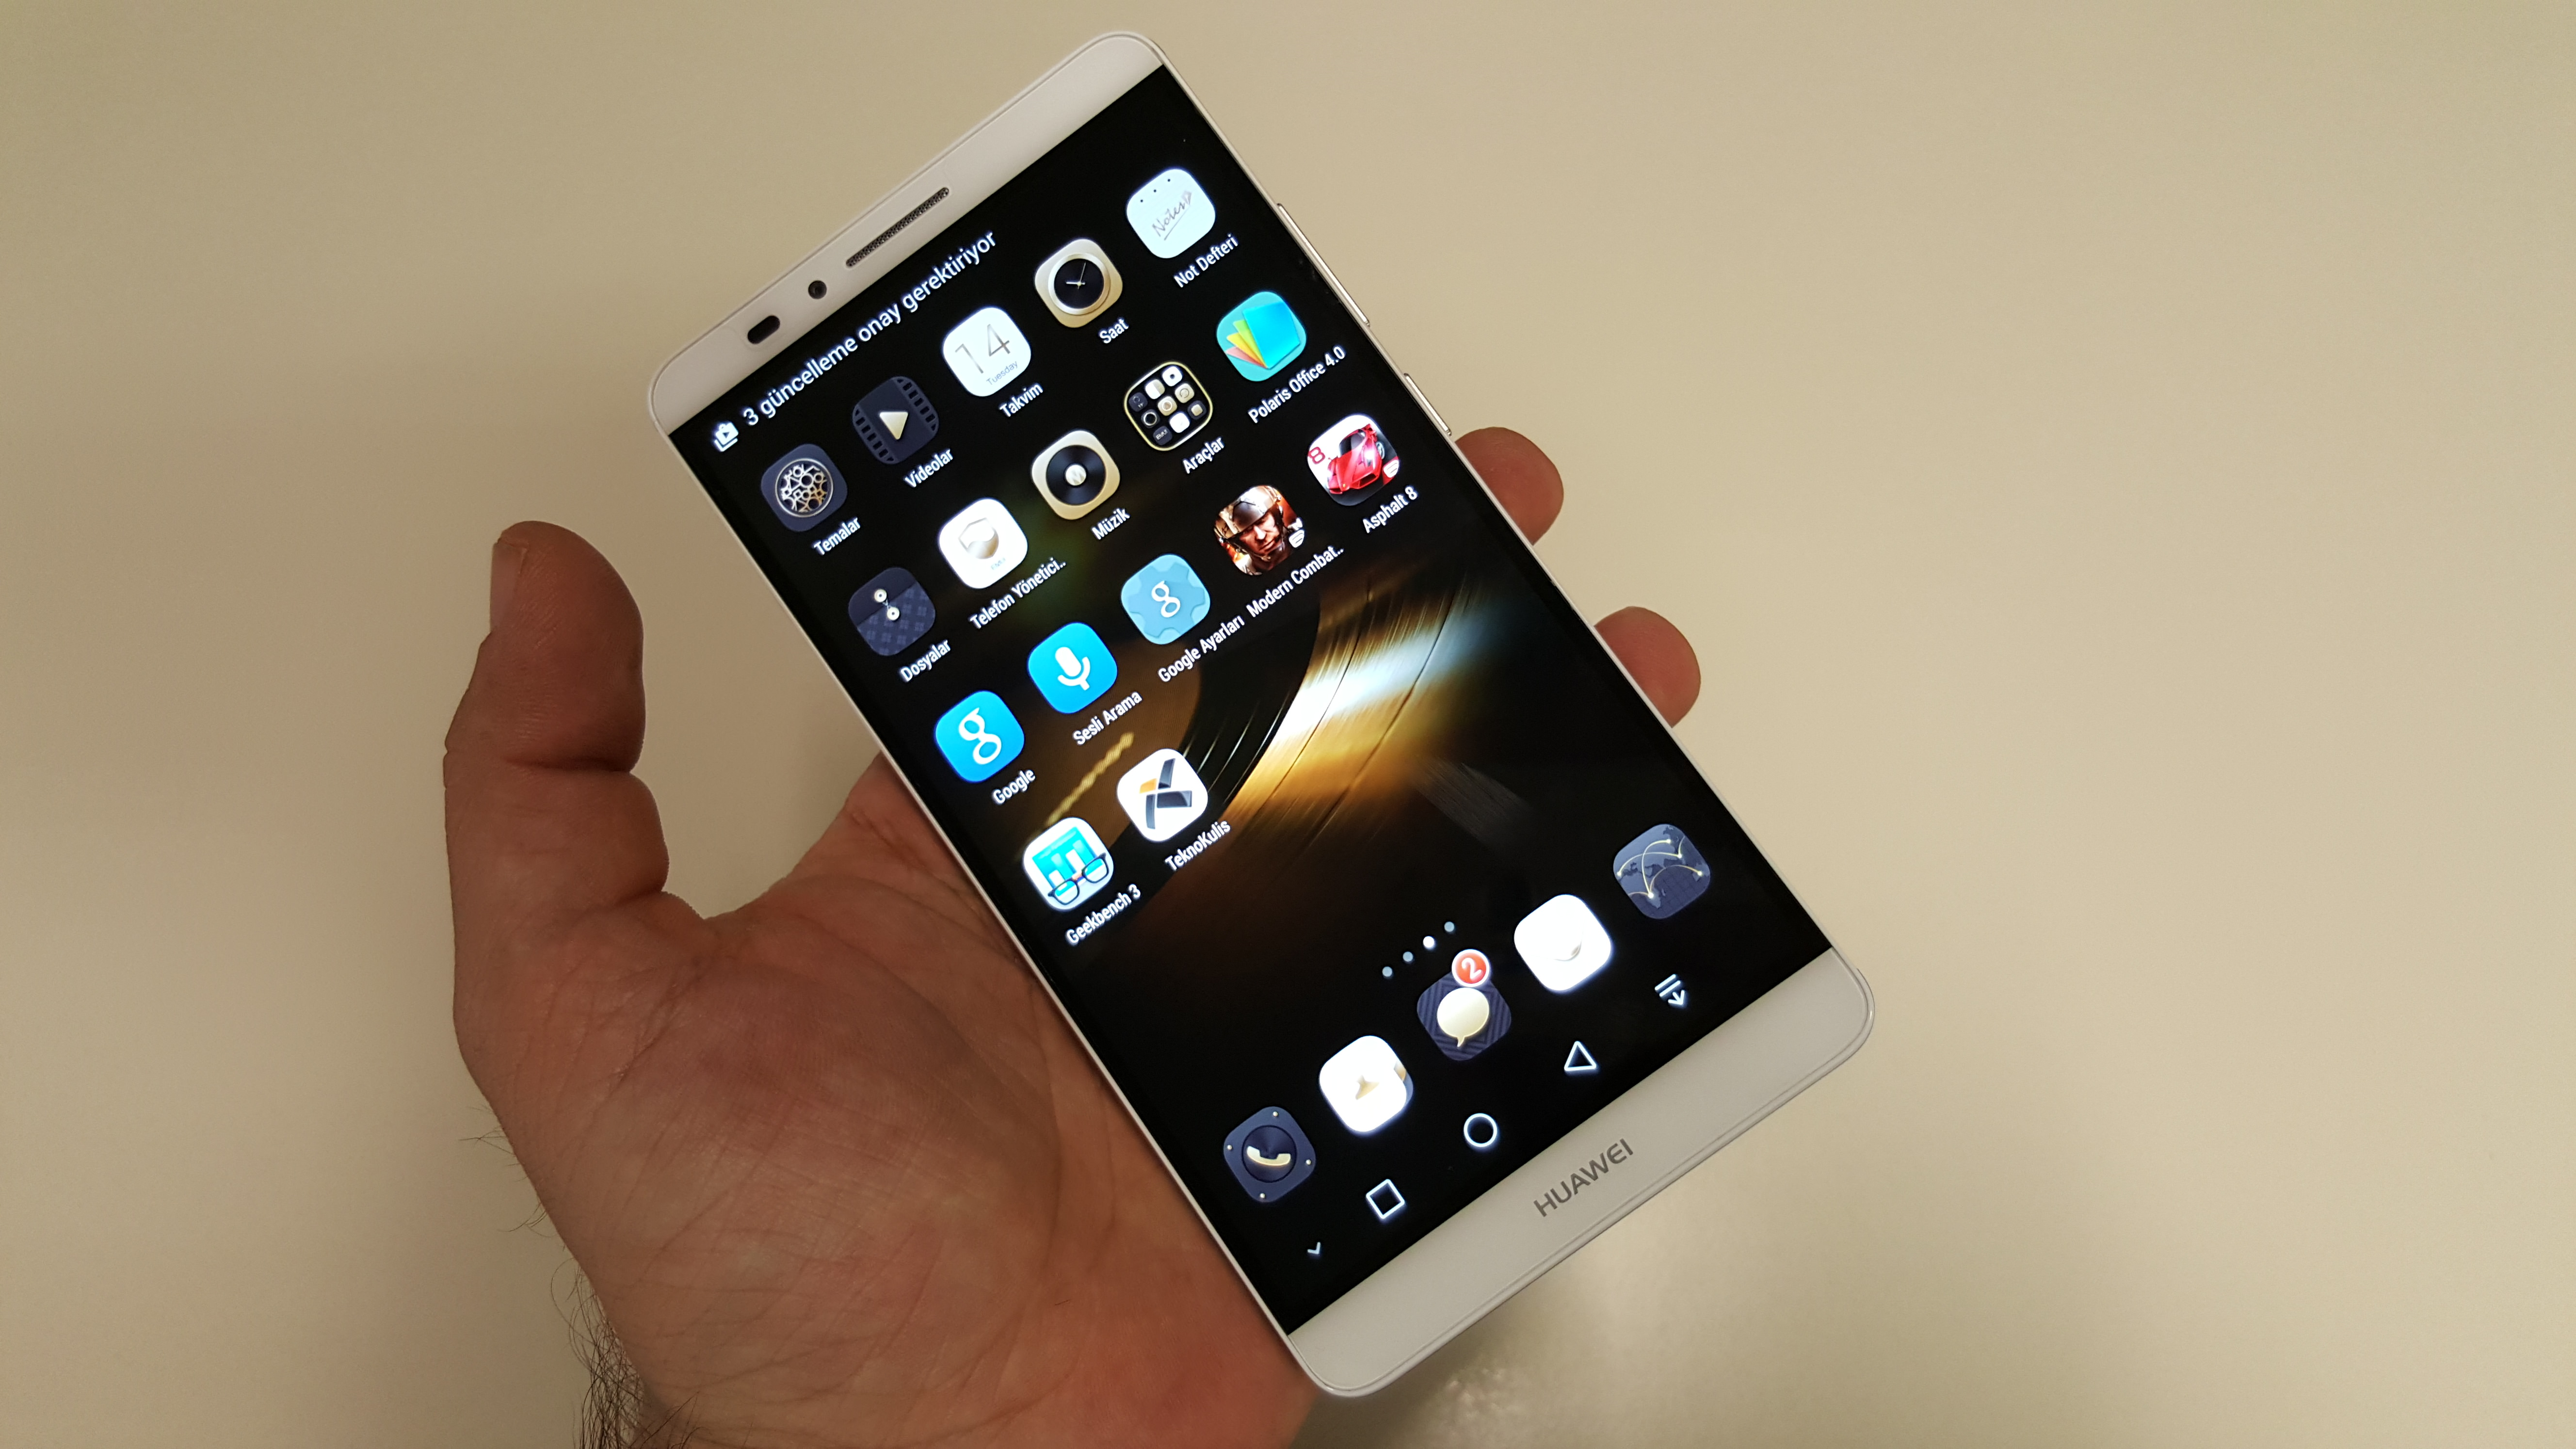 Huawei Ascend Mate 7'nin foto�raflar�